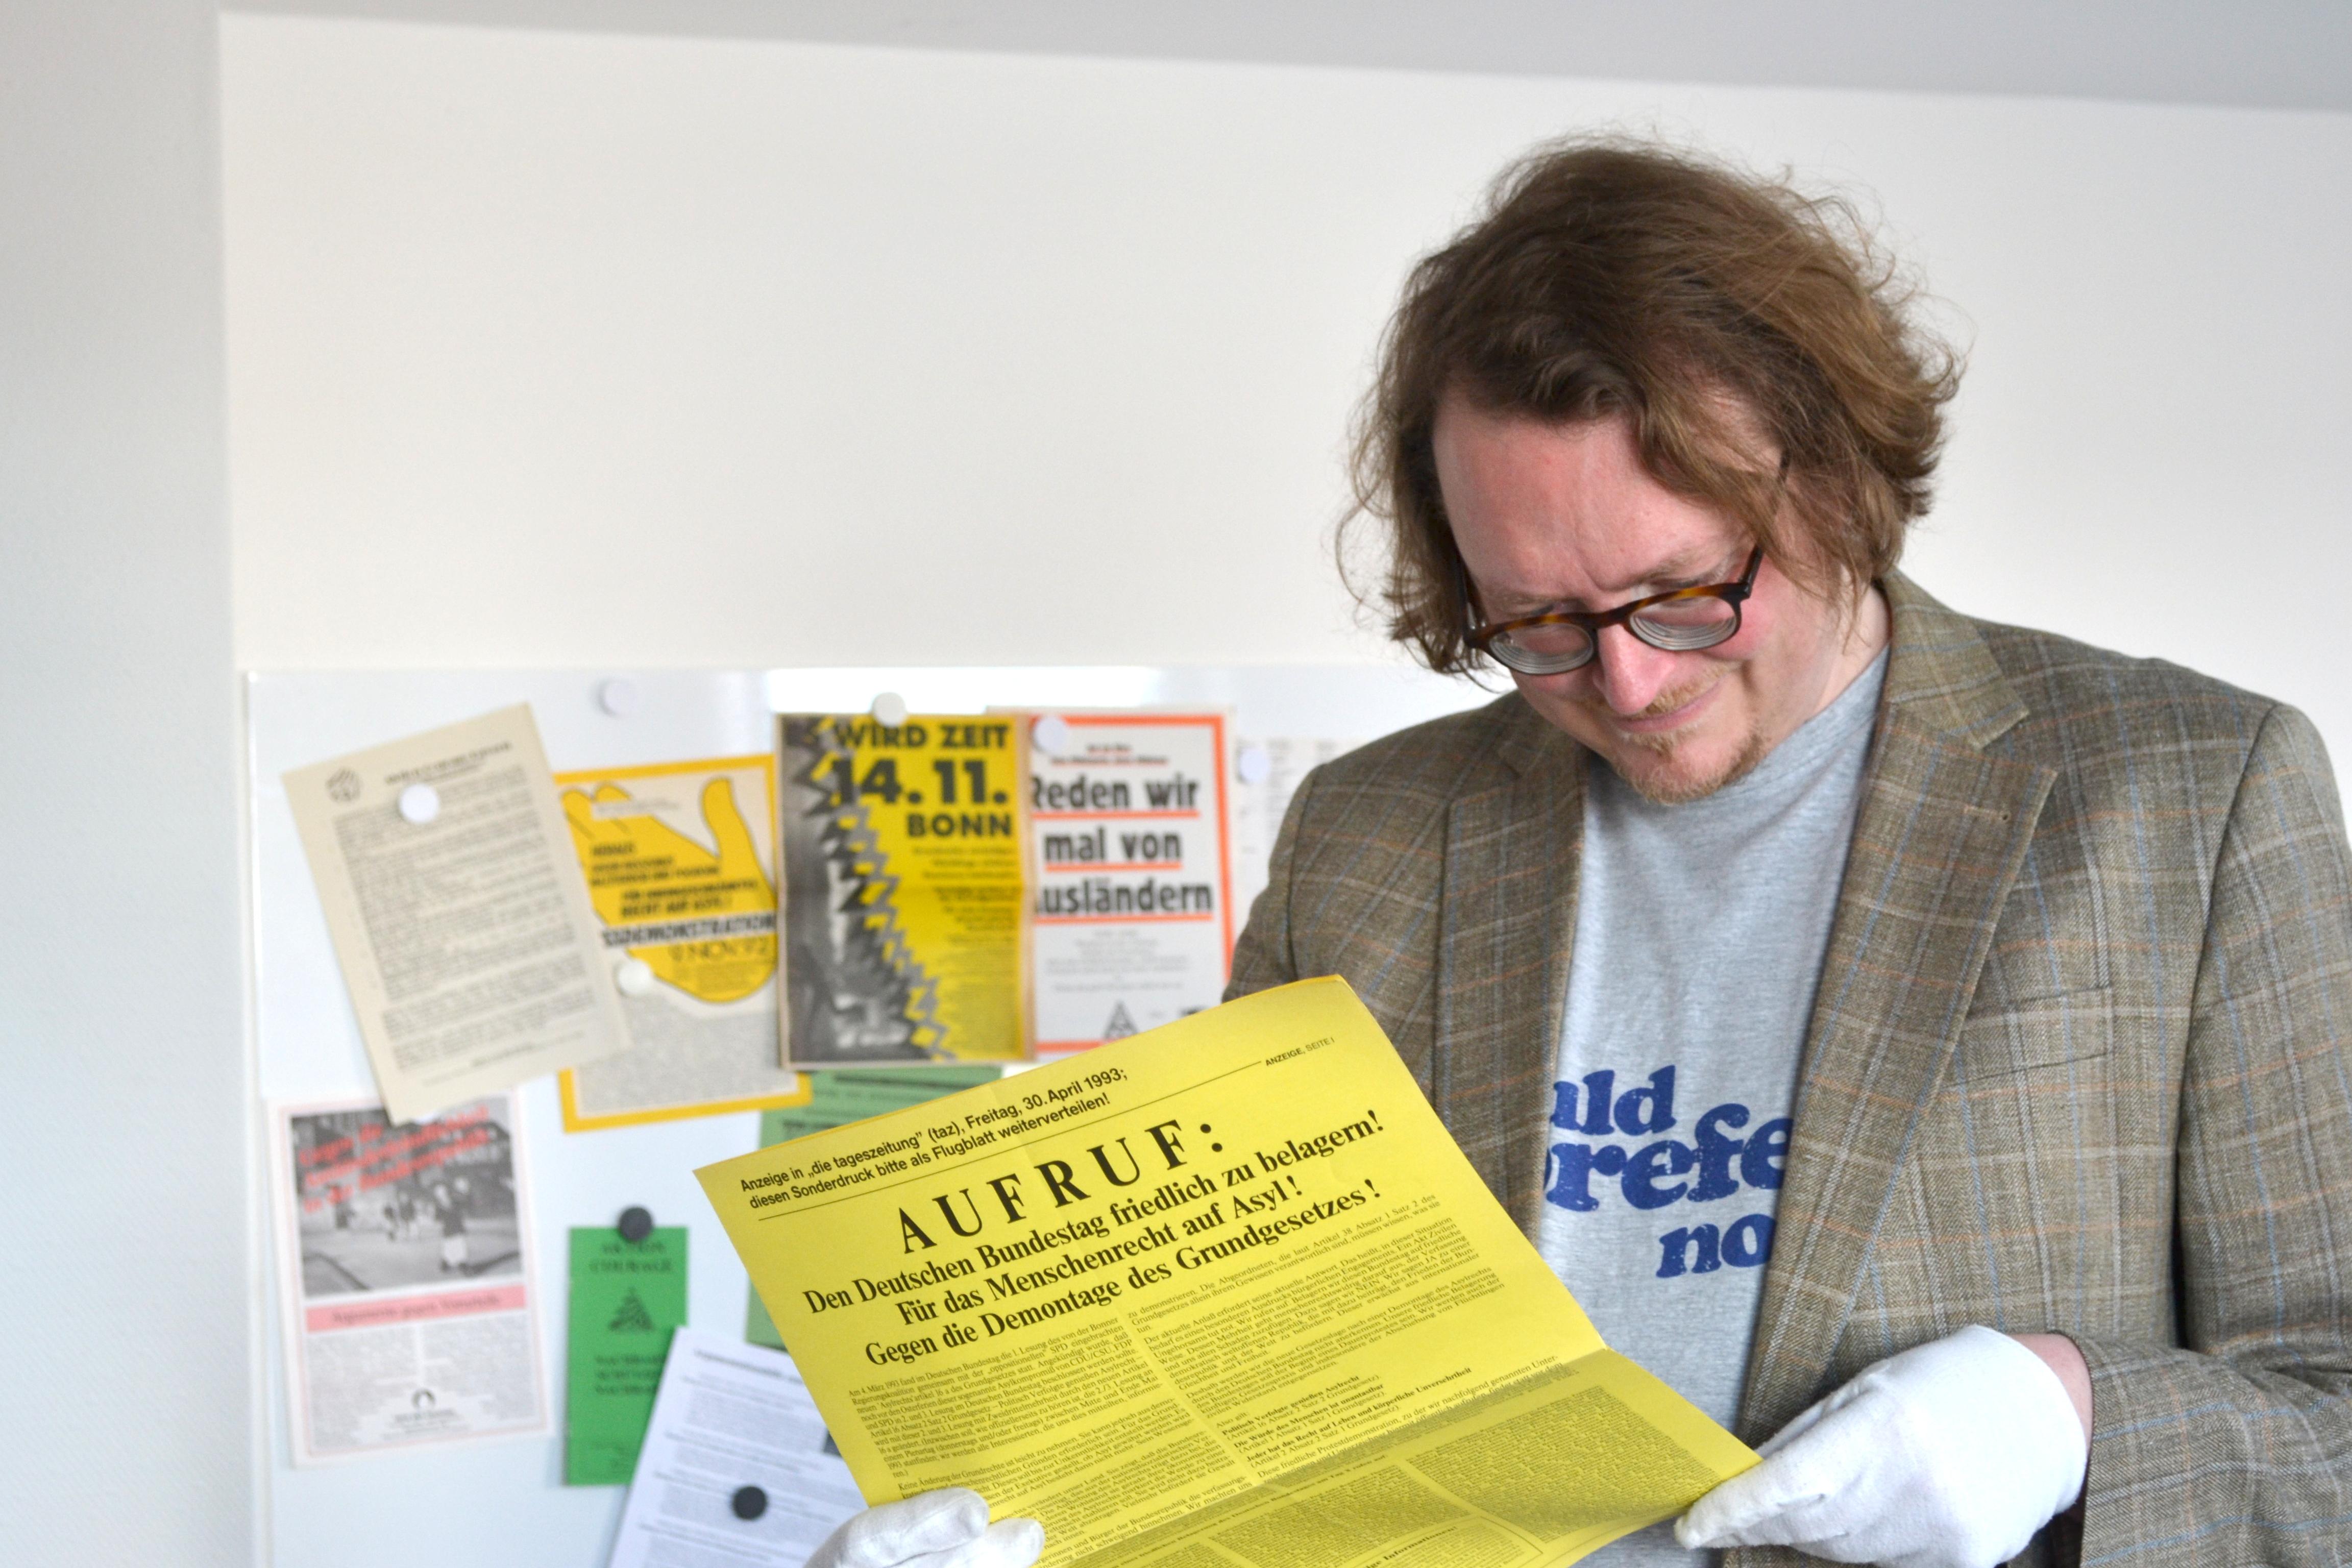 Christoph-Bongert-5-Wissenschaft-DAH-CPR-Deutsches-Auswandererhaus